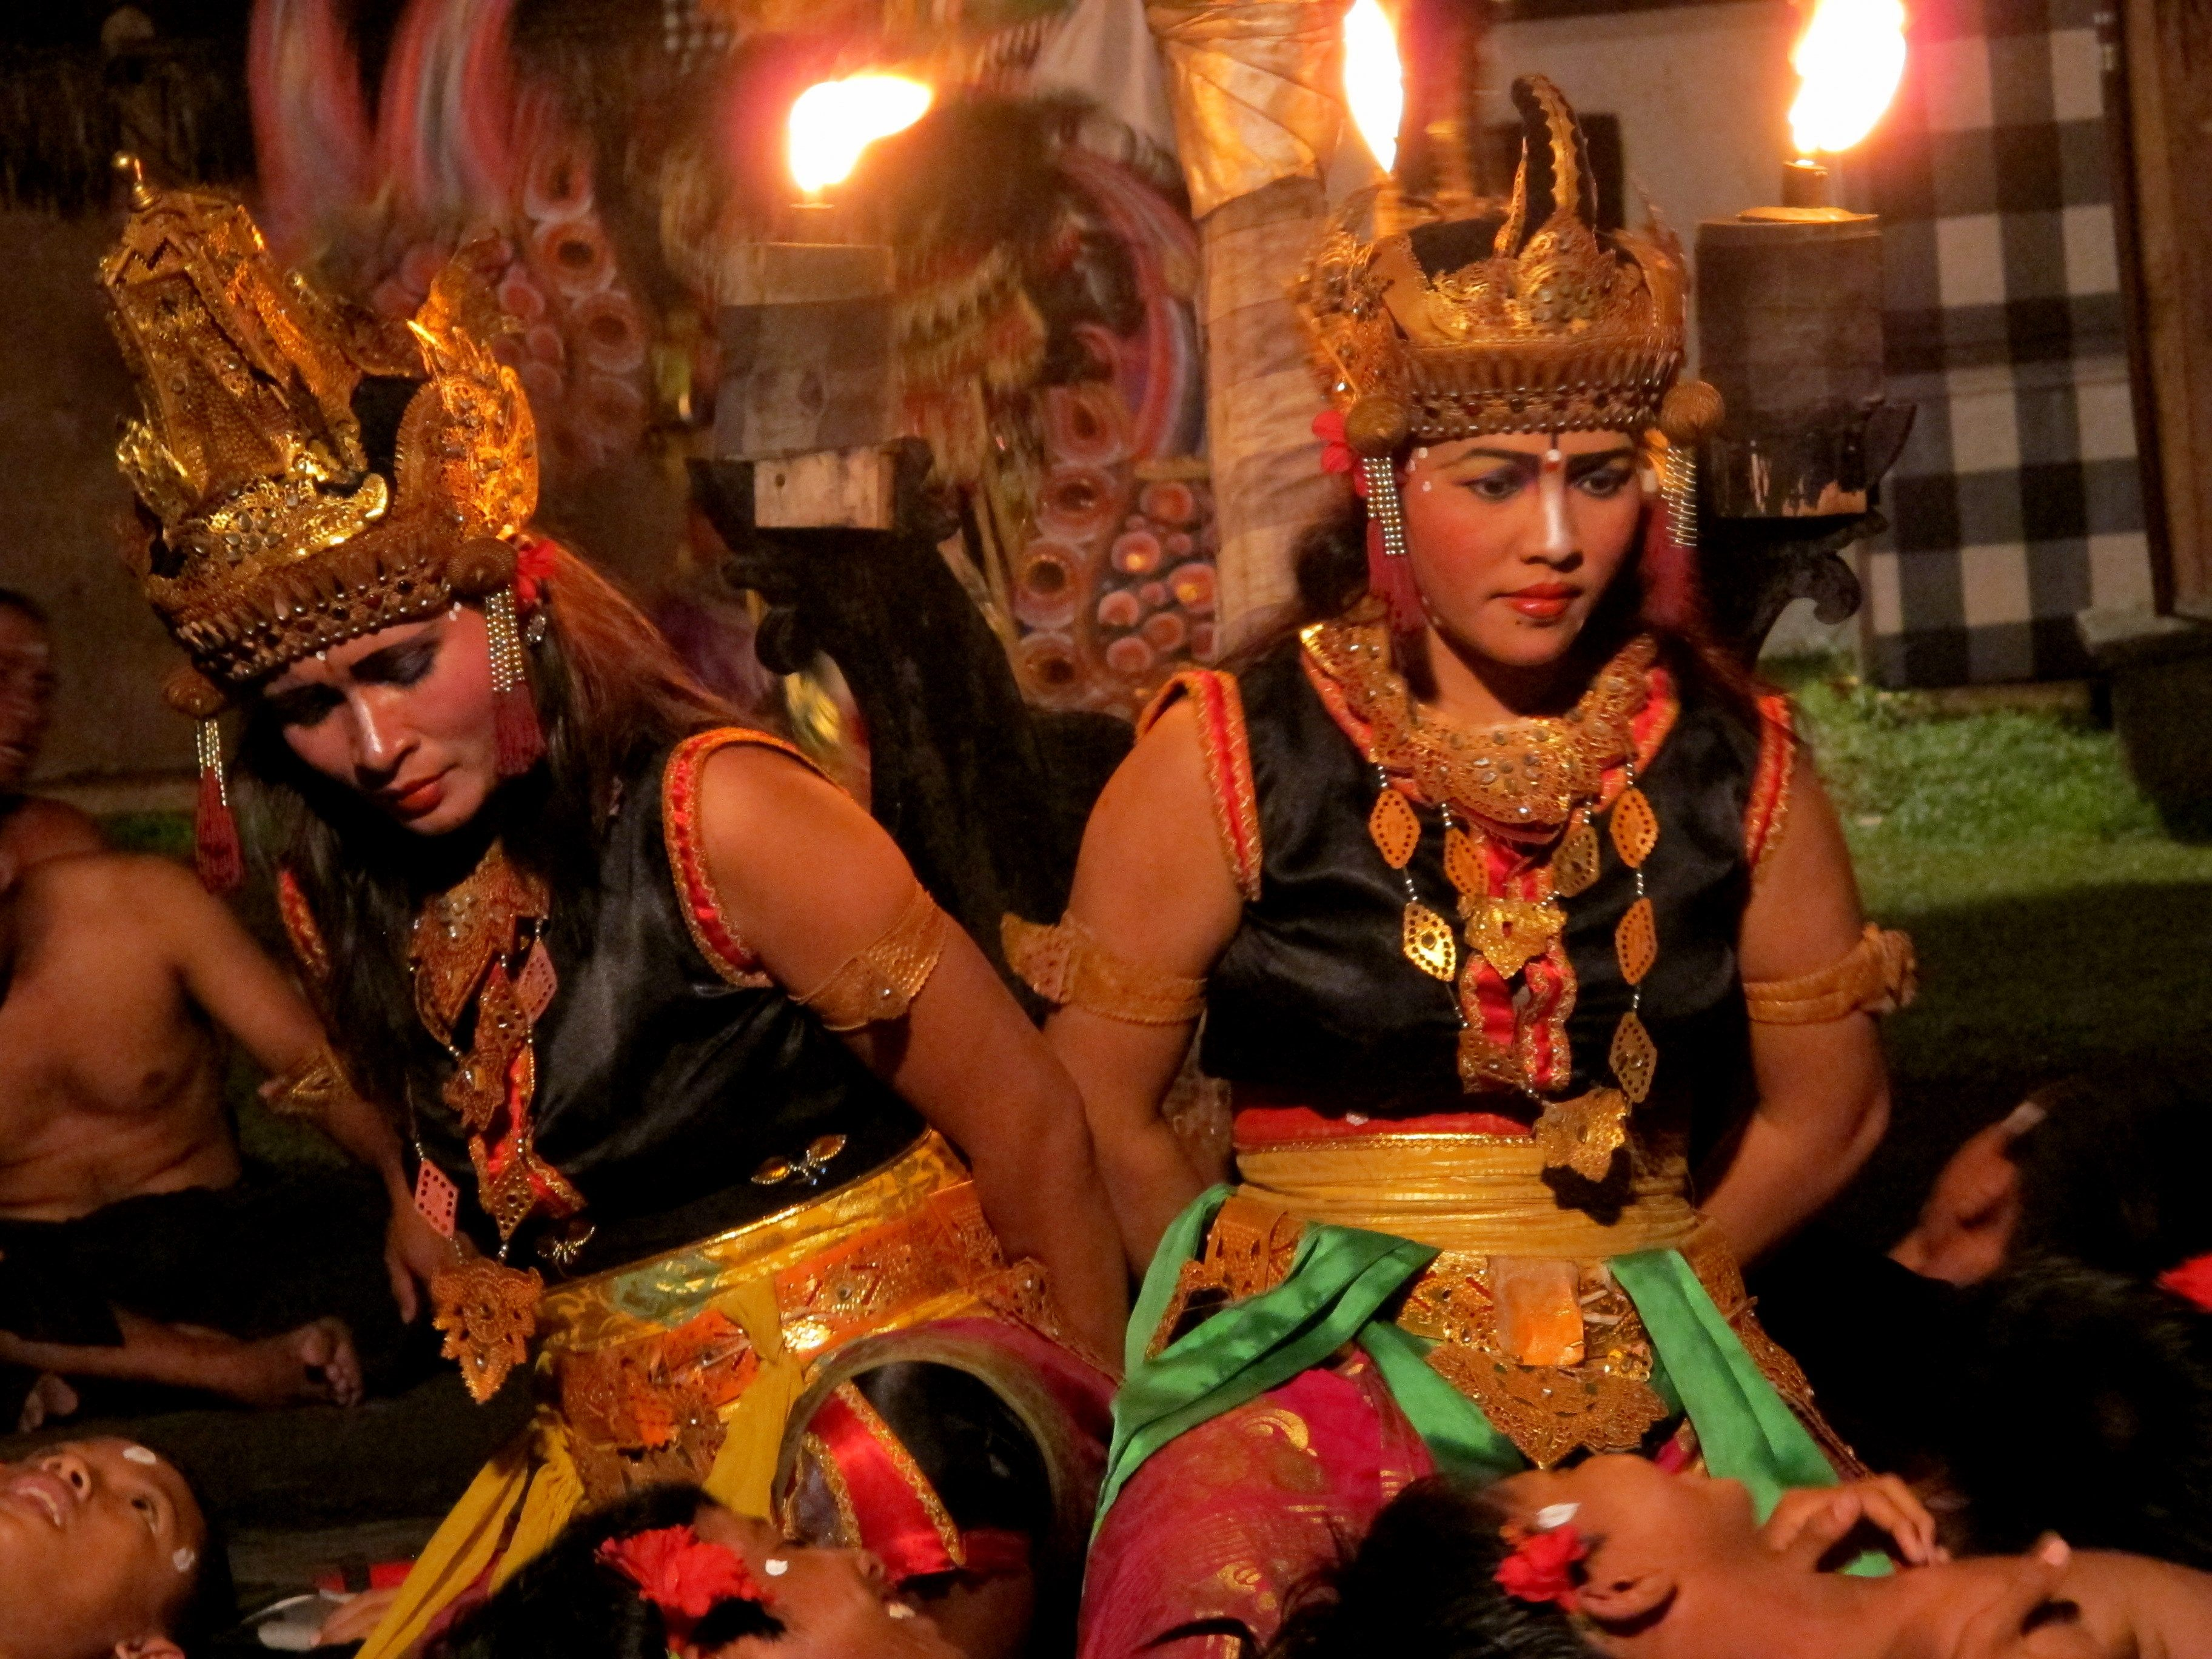 Kecak dance performance, Bali, Indonesia.